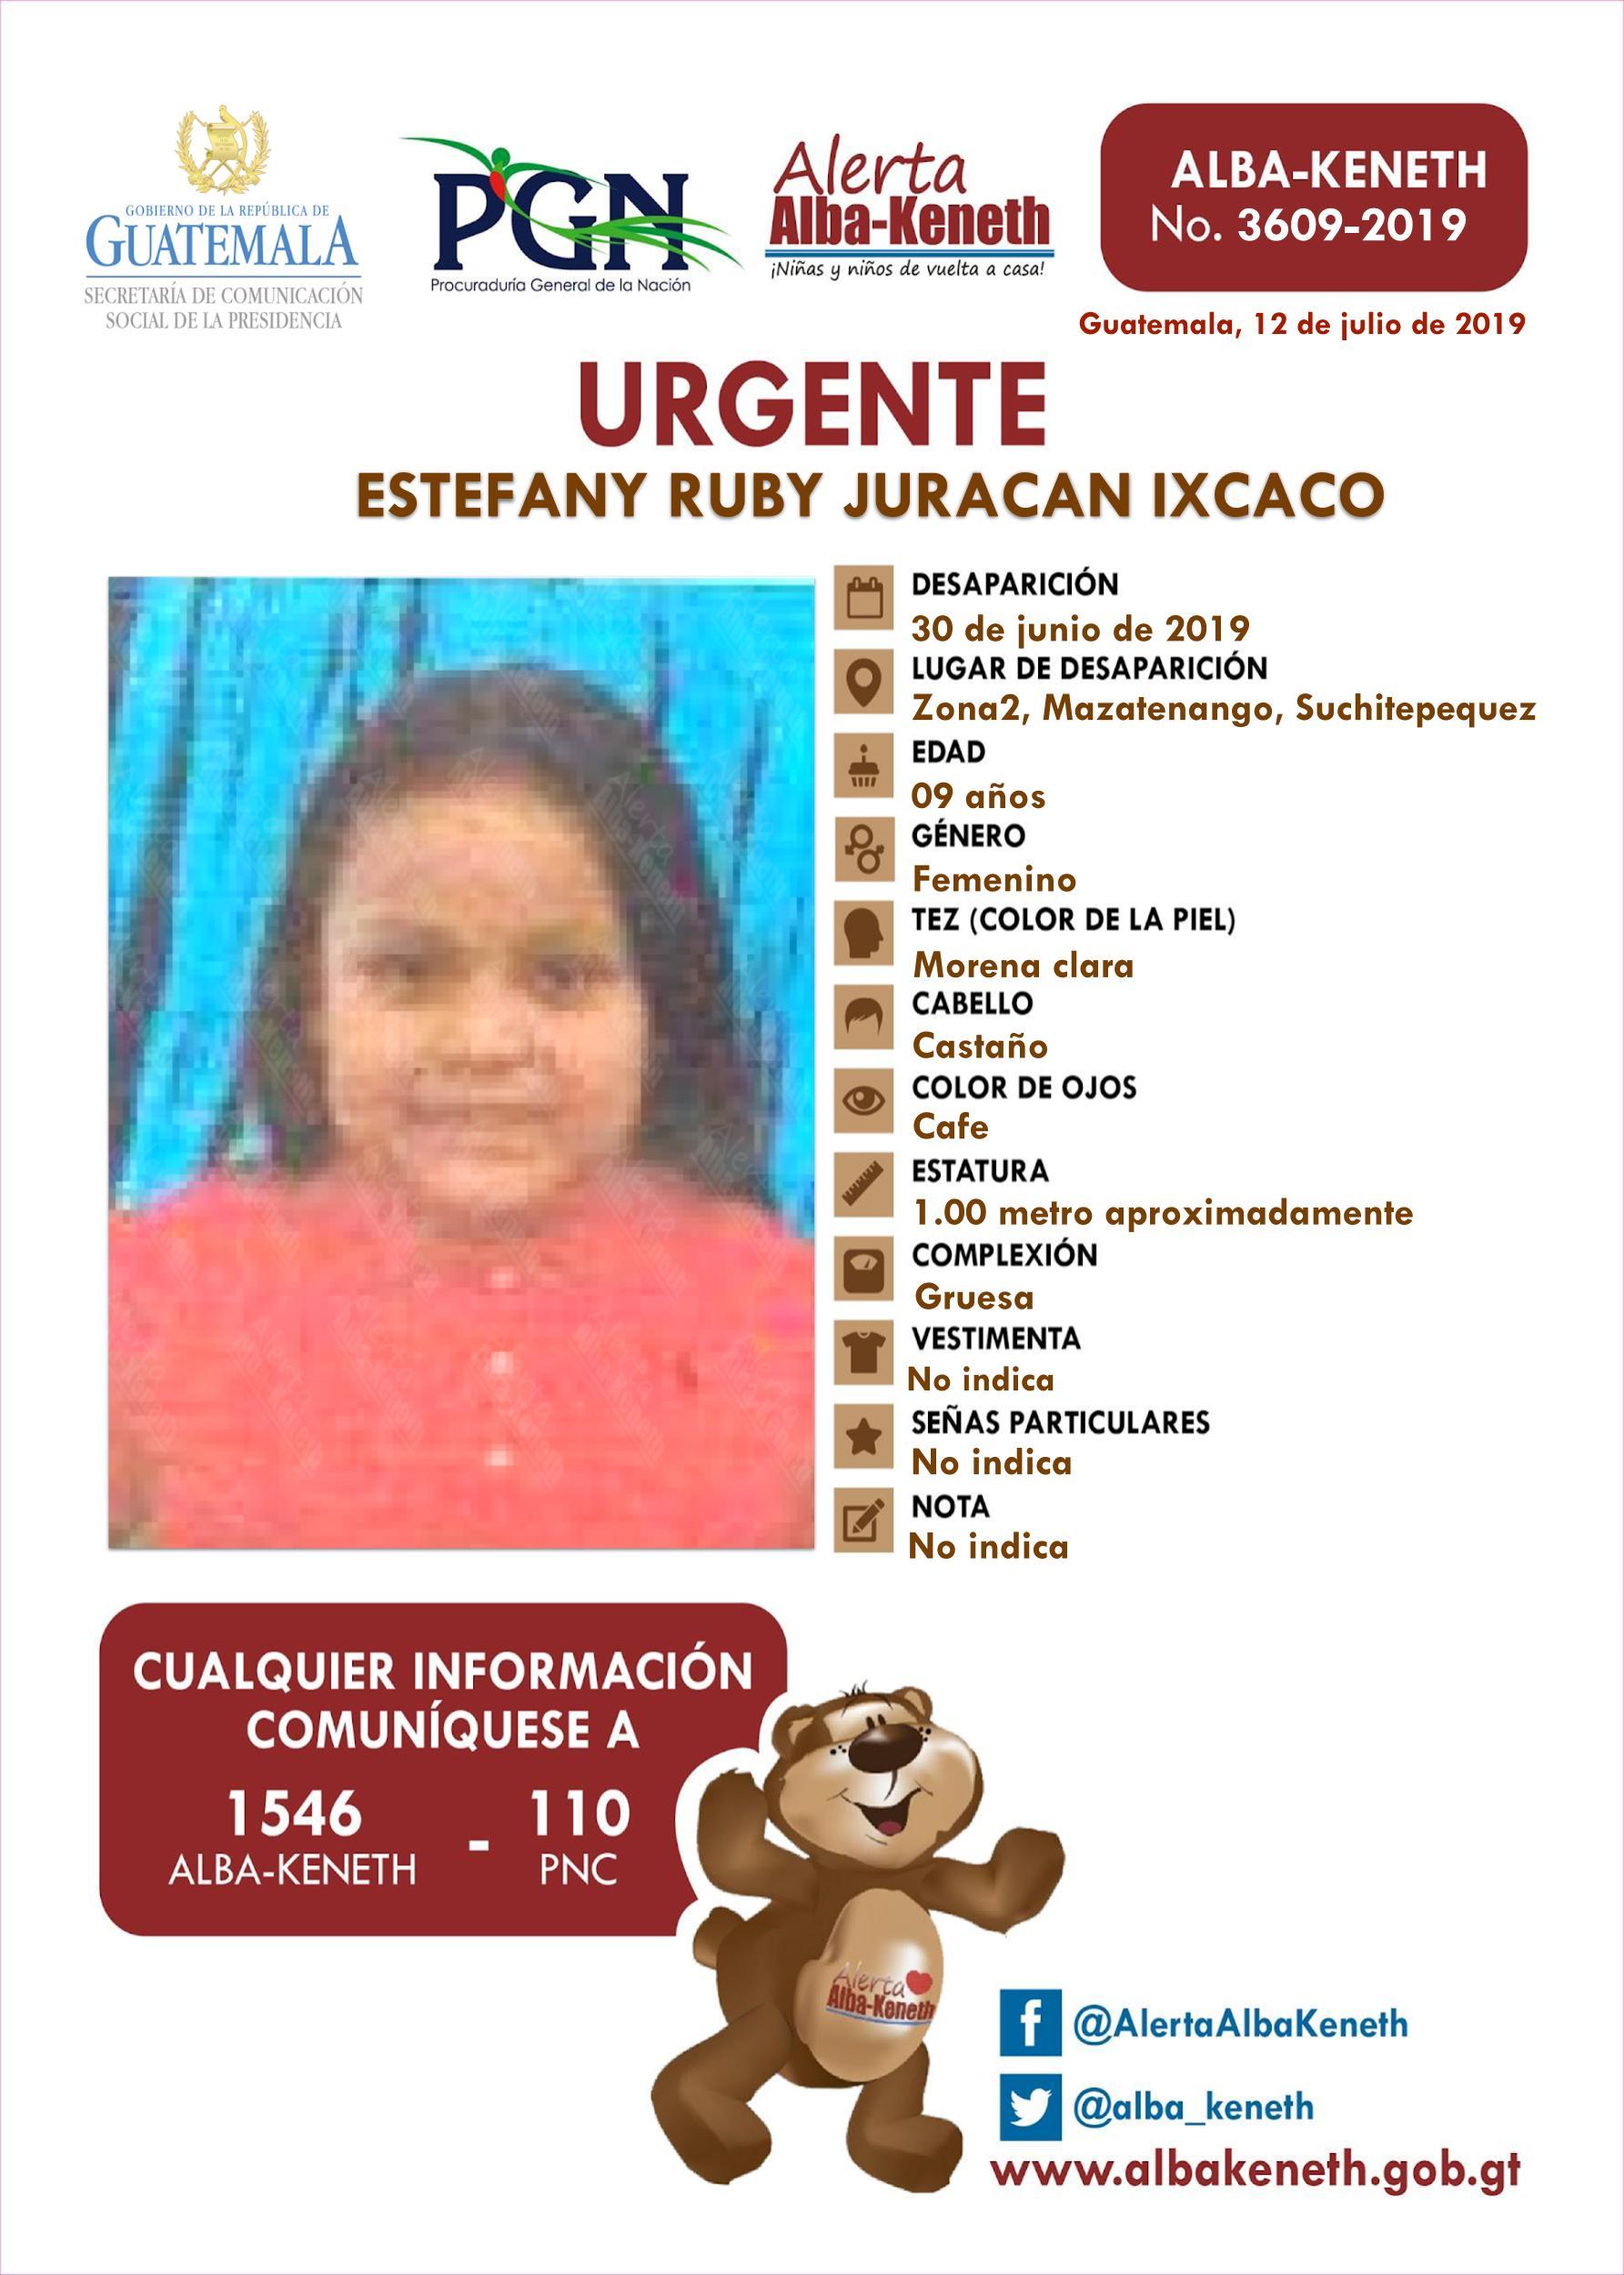 Estefany Ruby Juracan Ixcaco